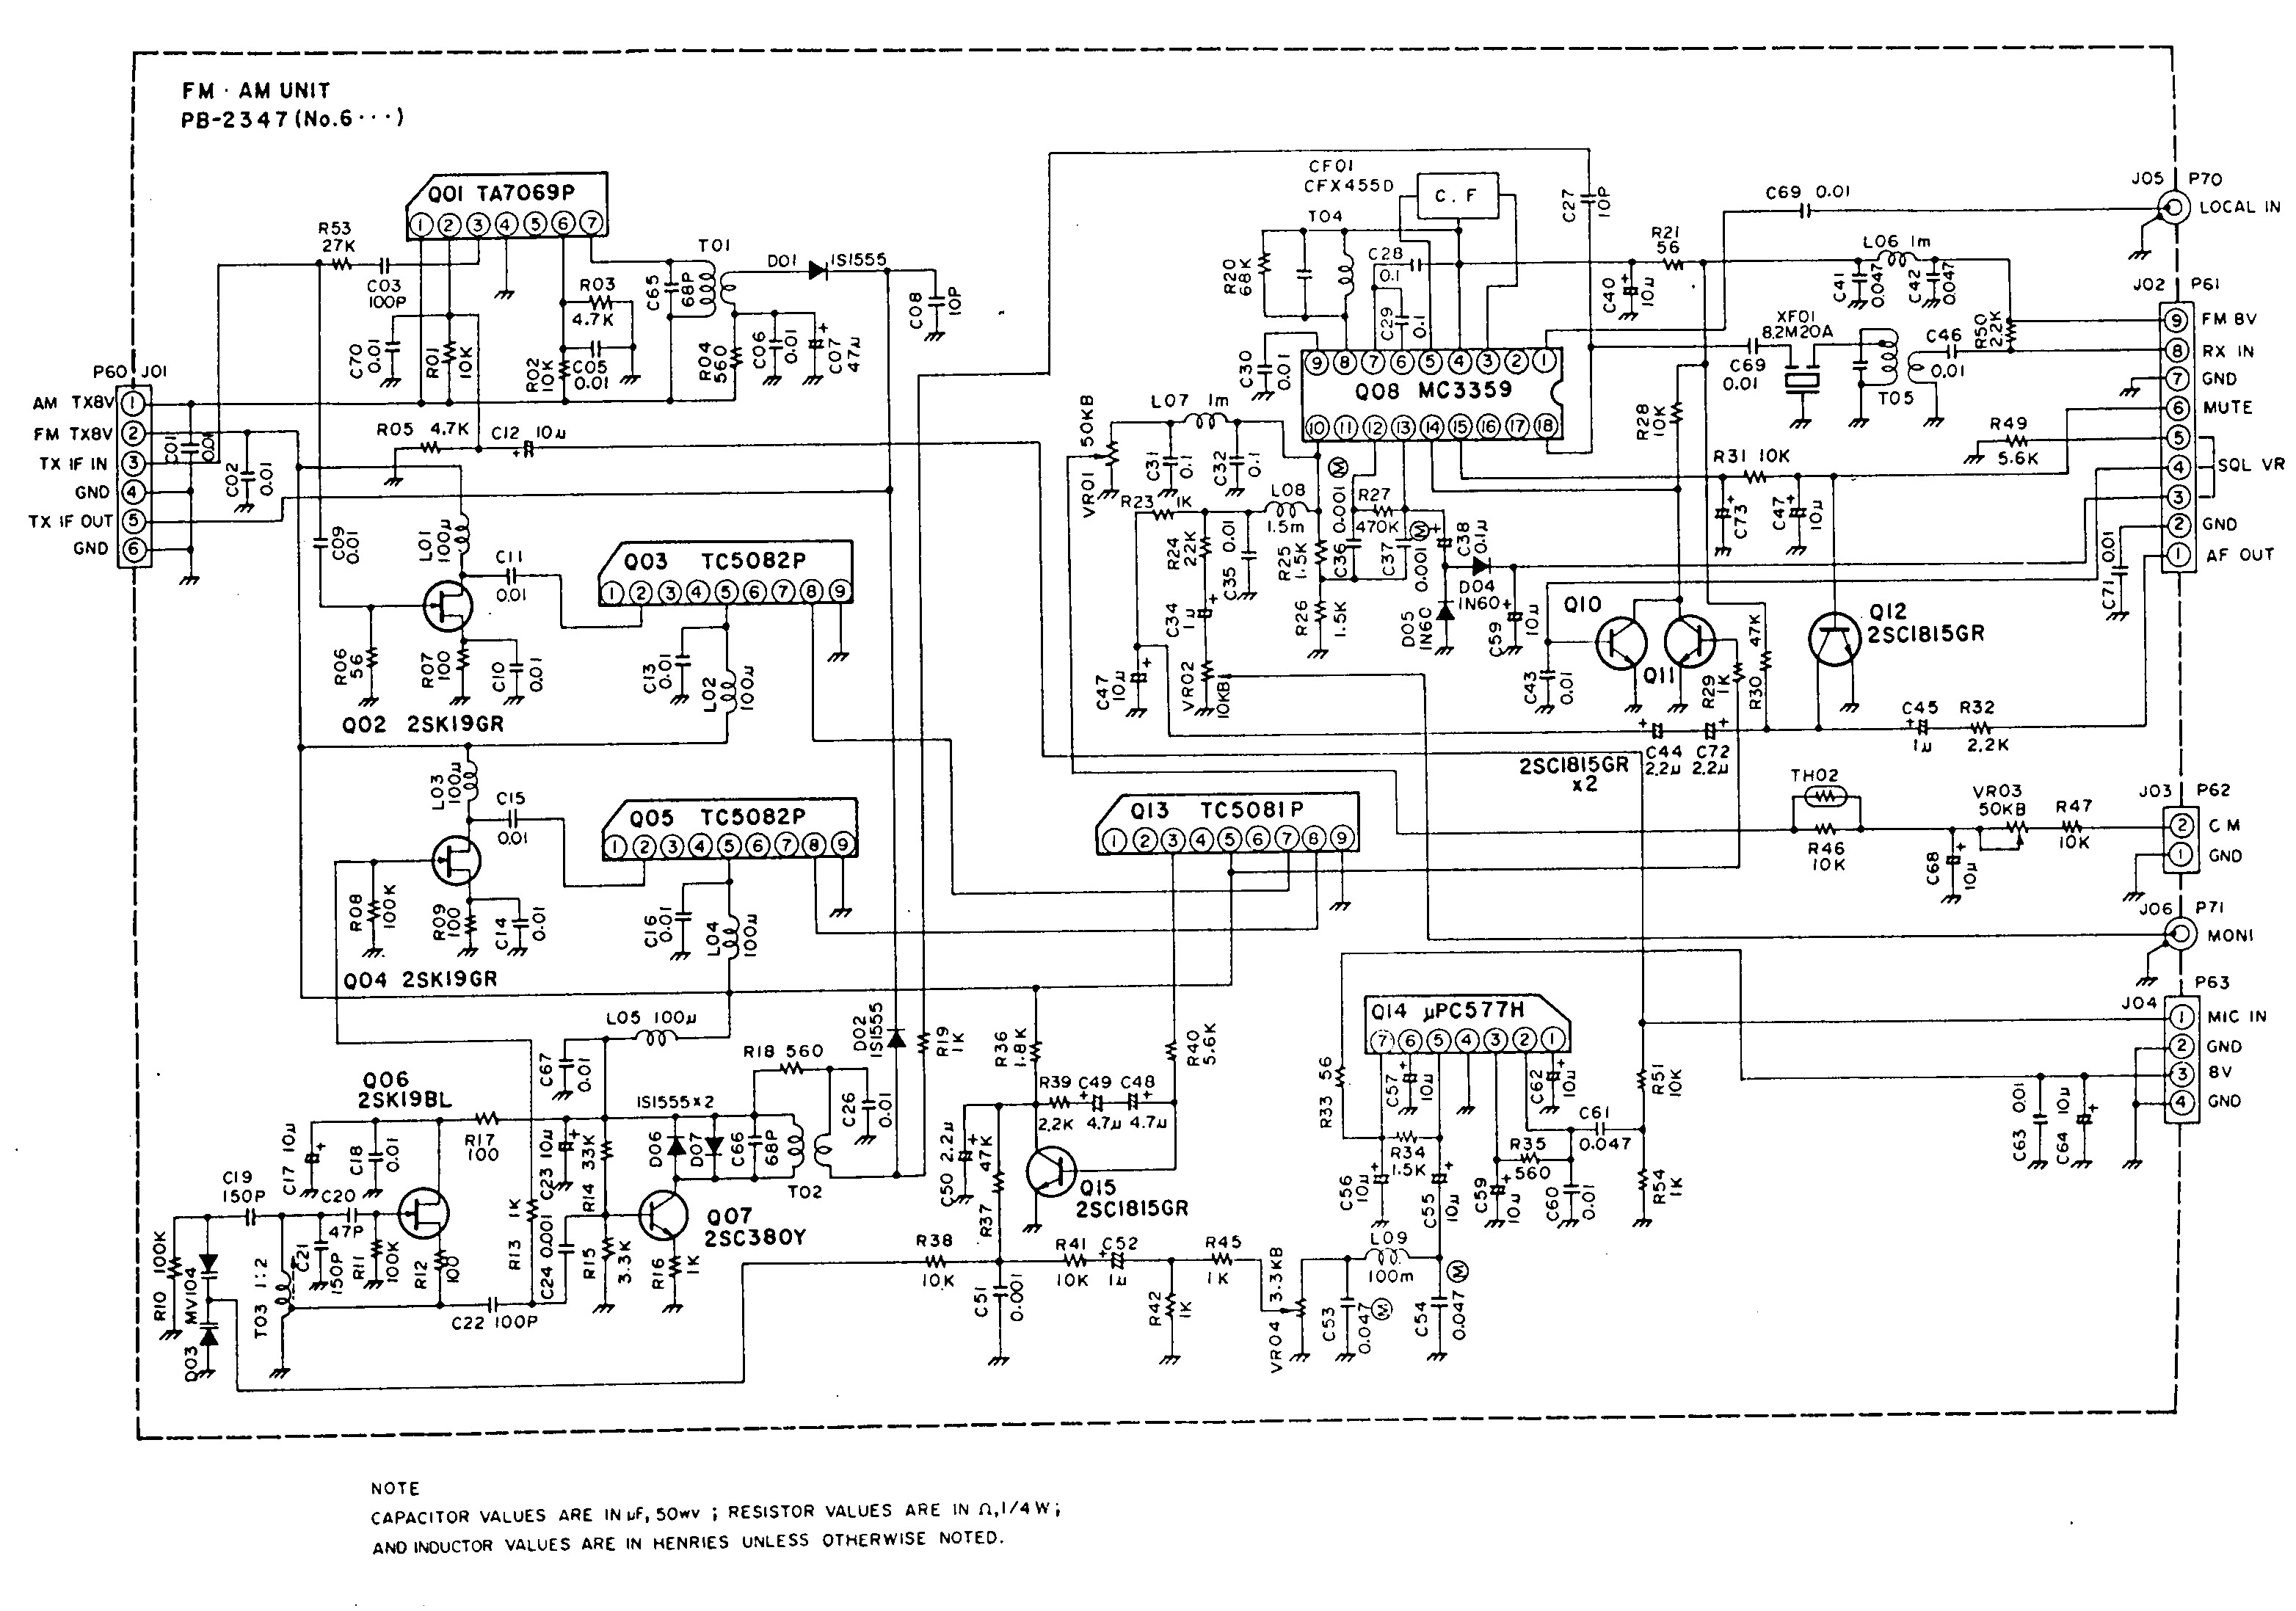 Ft 102 Circuit Boards By W4clm Fox Tango International Dc Power Supply For Ham Radio Transceivers Using Ic7812 Pb 2347 Optional Am Fm Unit